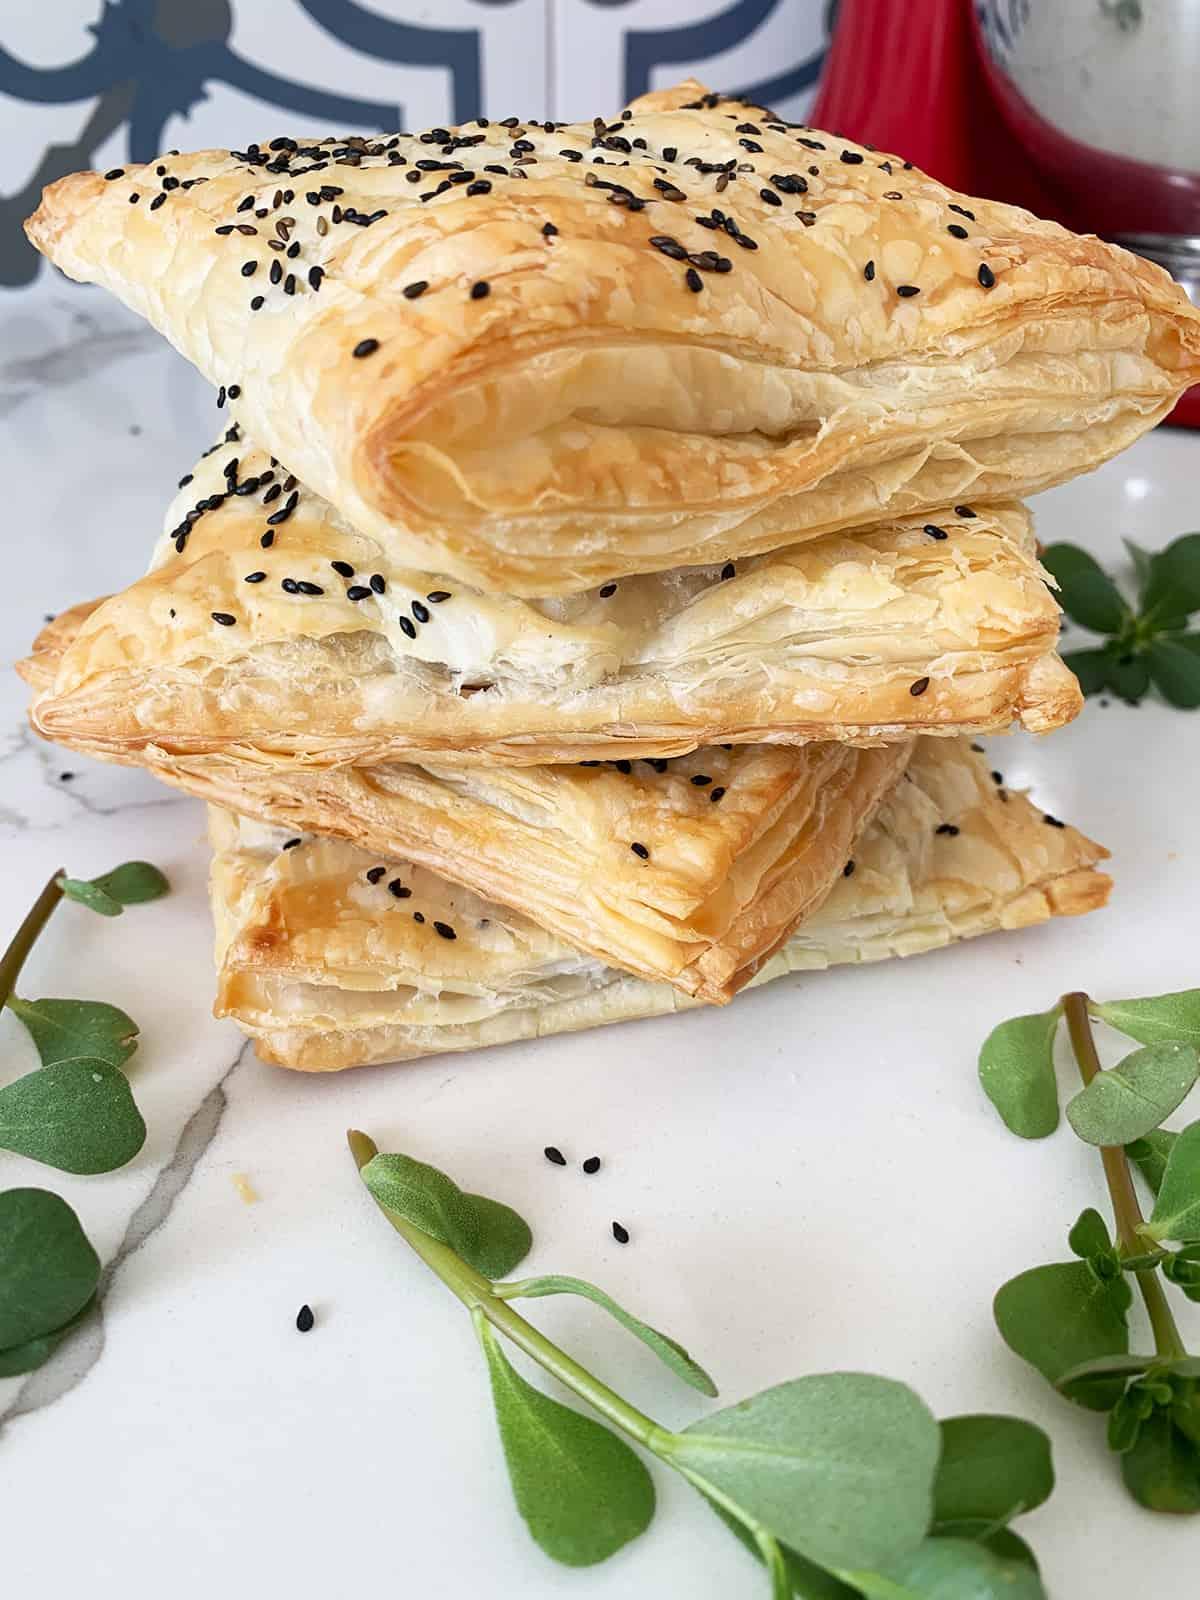 Purslane/bakleh recipe pockets stacked in four